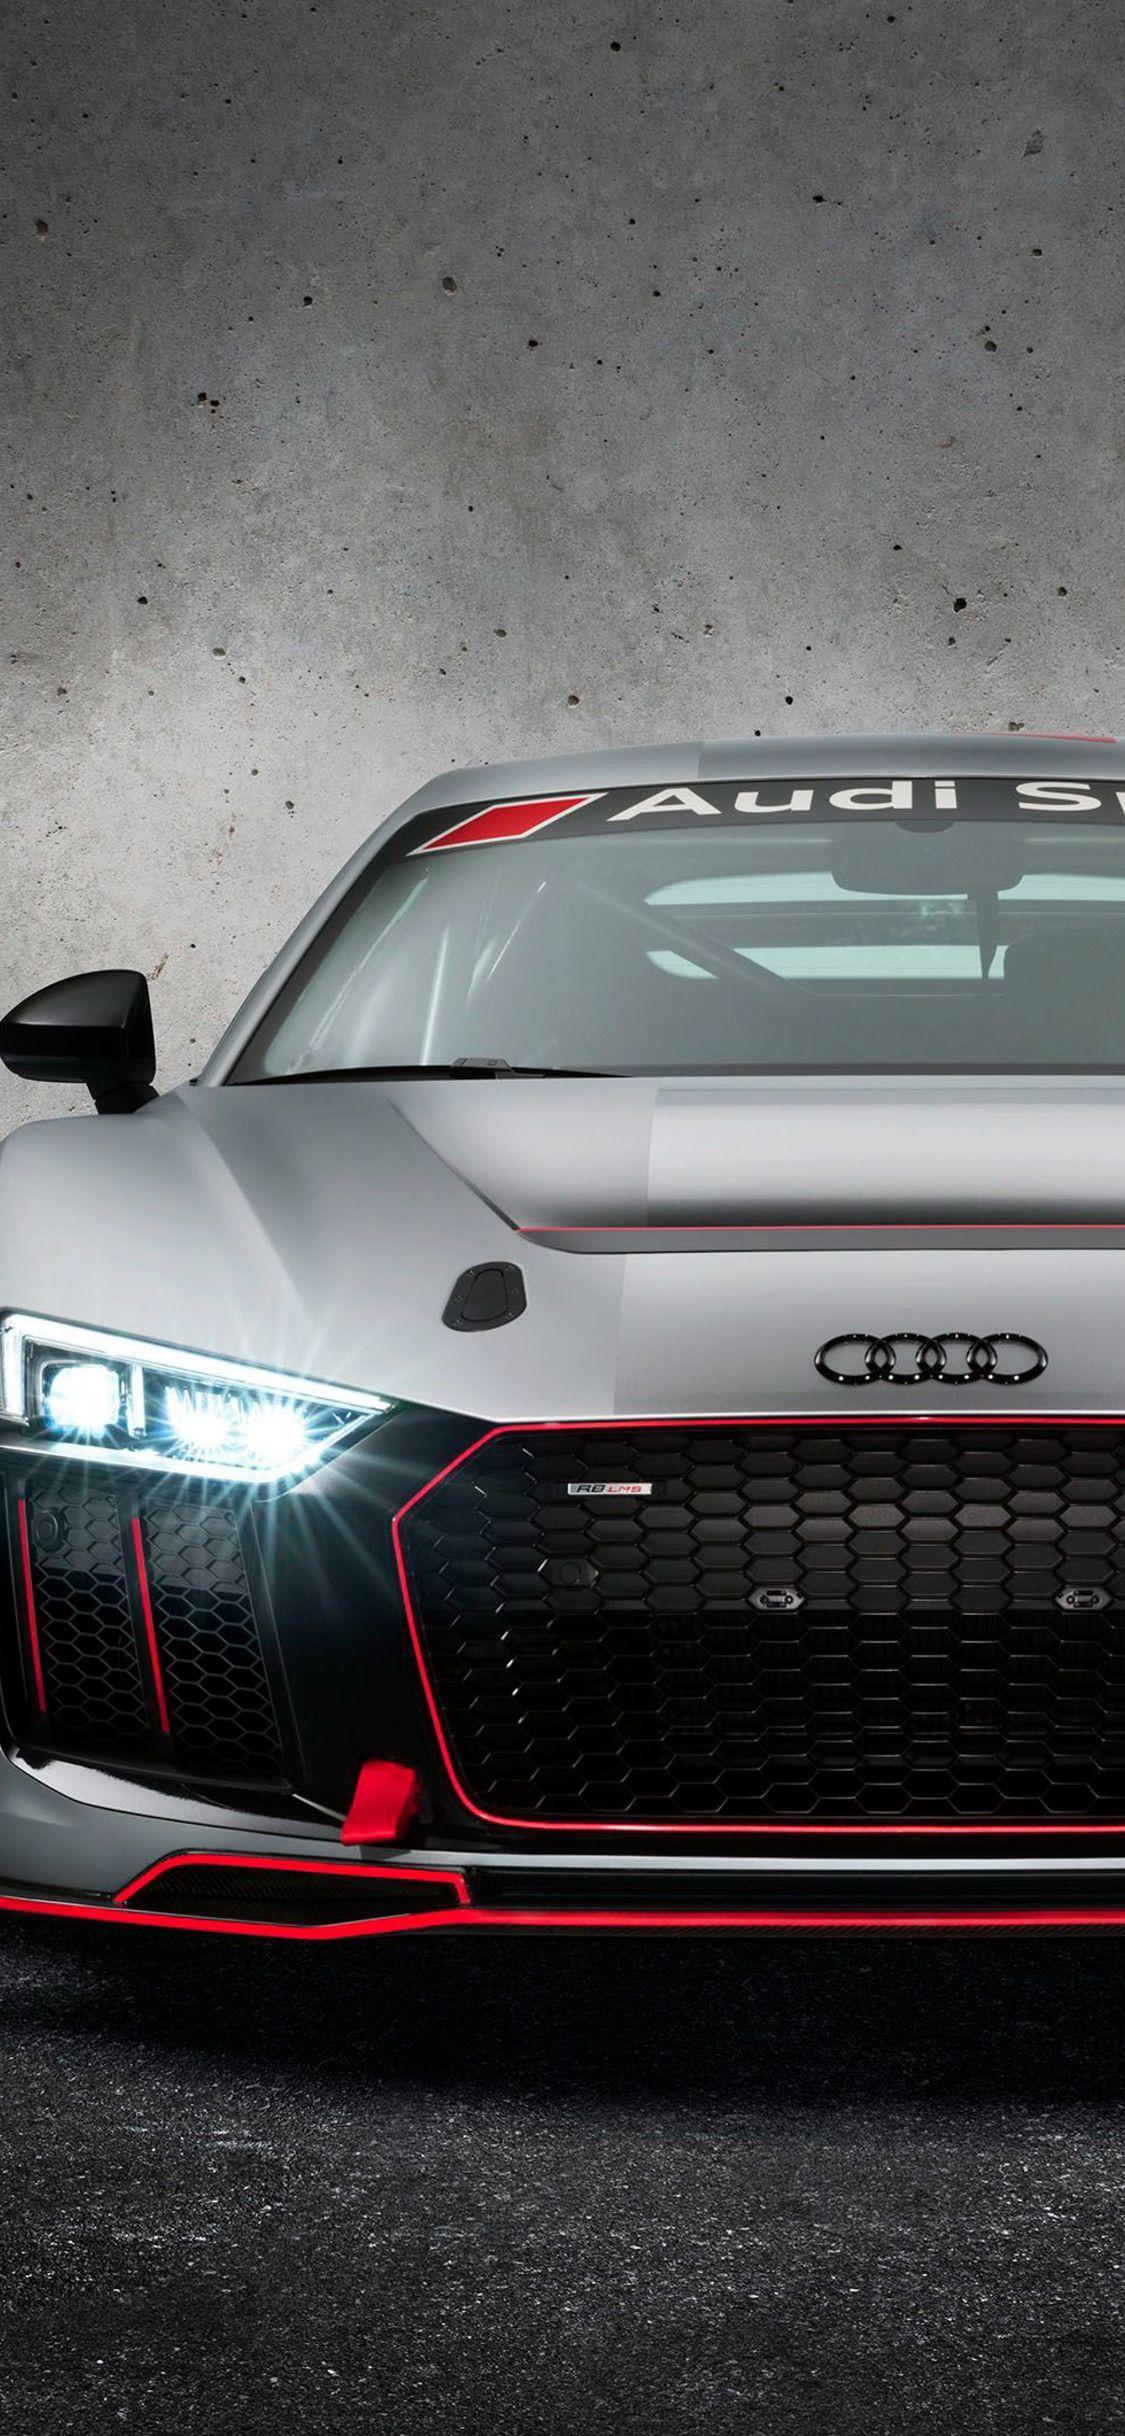 Iphone Xr Wallpaper 4k Car in 2020 Audi r8, Audi r8